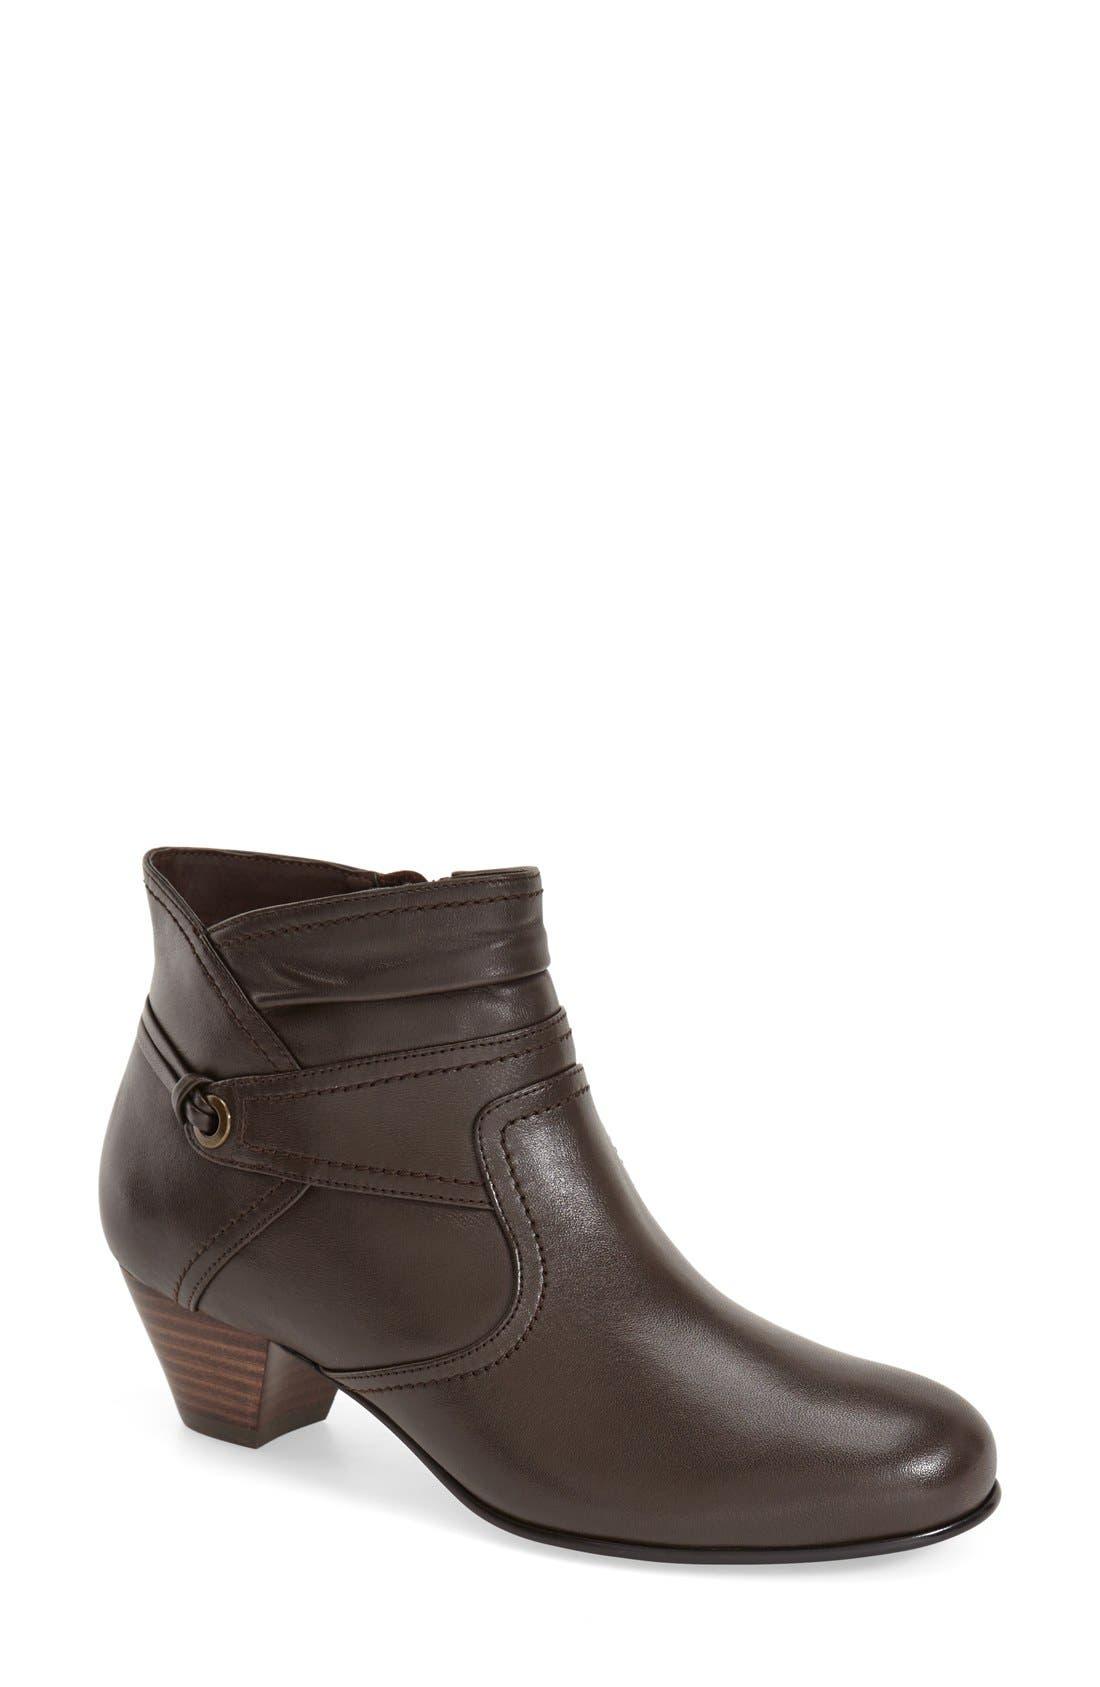 'Campus' Boot,                         Main,                         color, Brown Calfskin